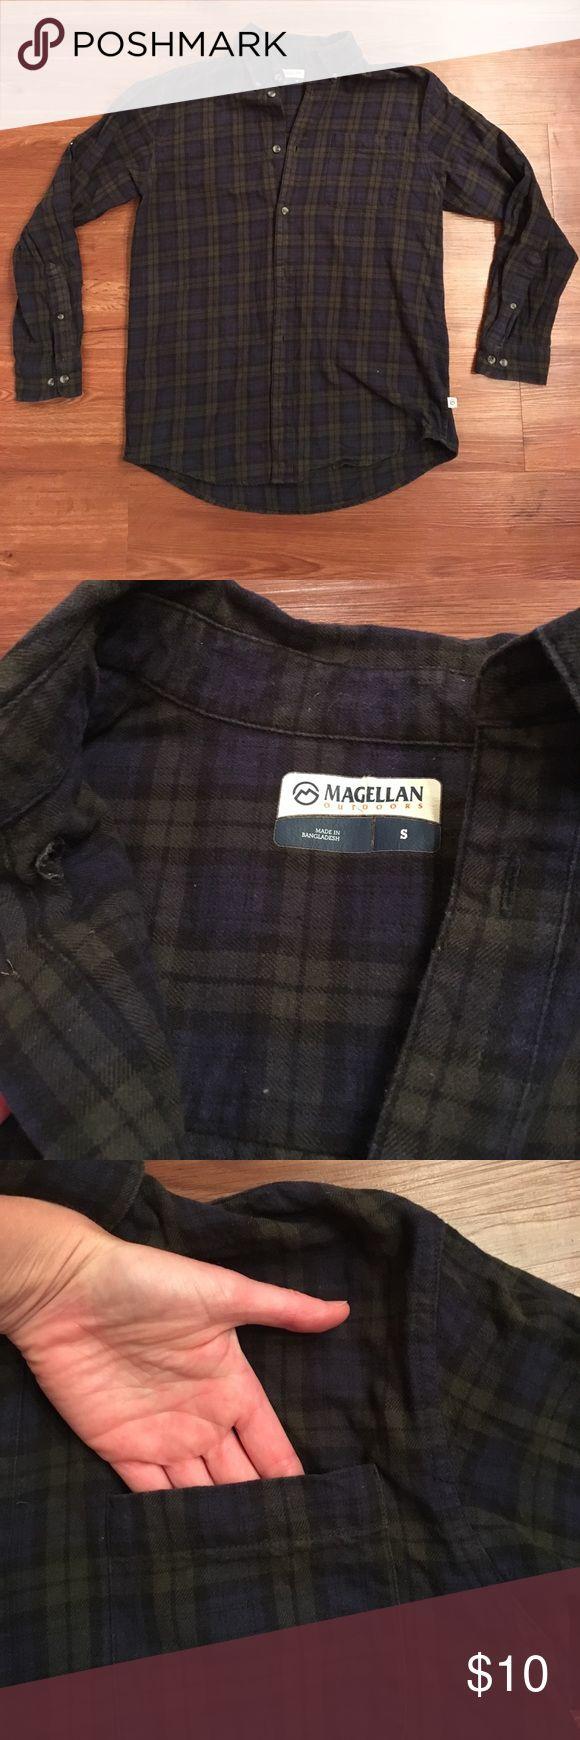 Magellan dark green and blue flannel shirt Magellan dark green and blue flannel shirt, men's small. Worn but still in good shape. magellan Shirts Casual Button Down Shirts